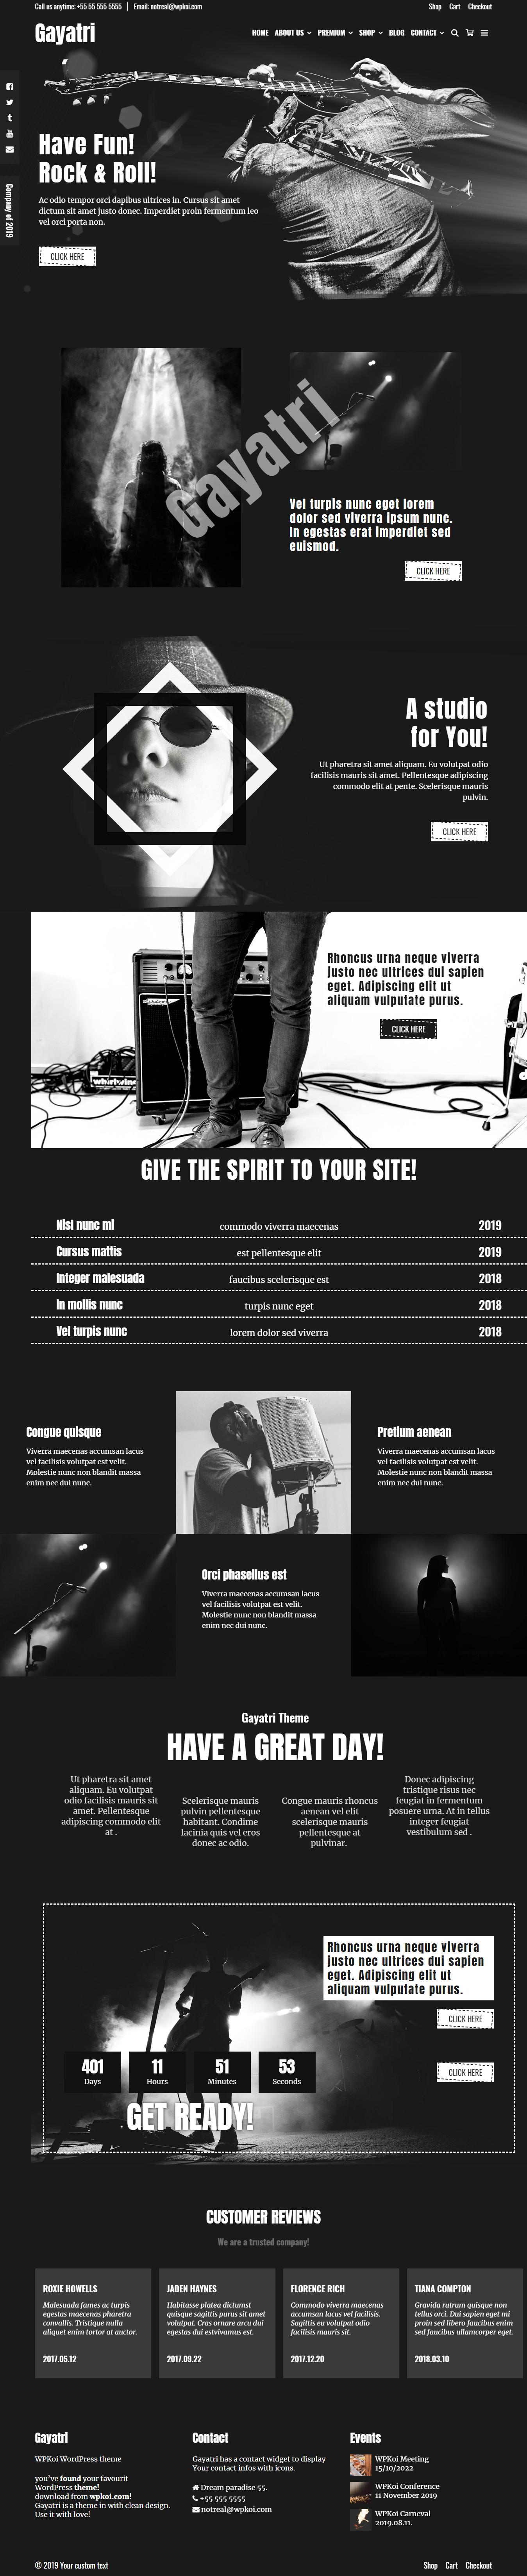 Gayatri - Best Free Video and Music WordPress Theme